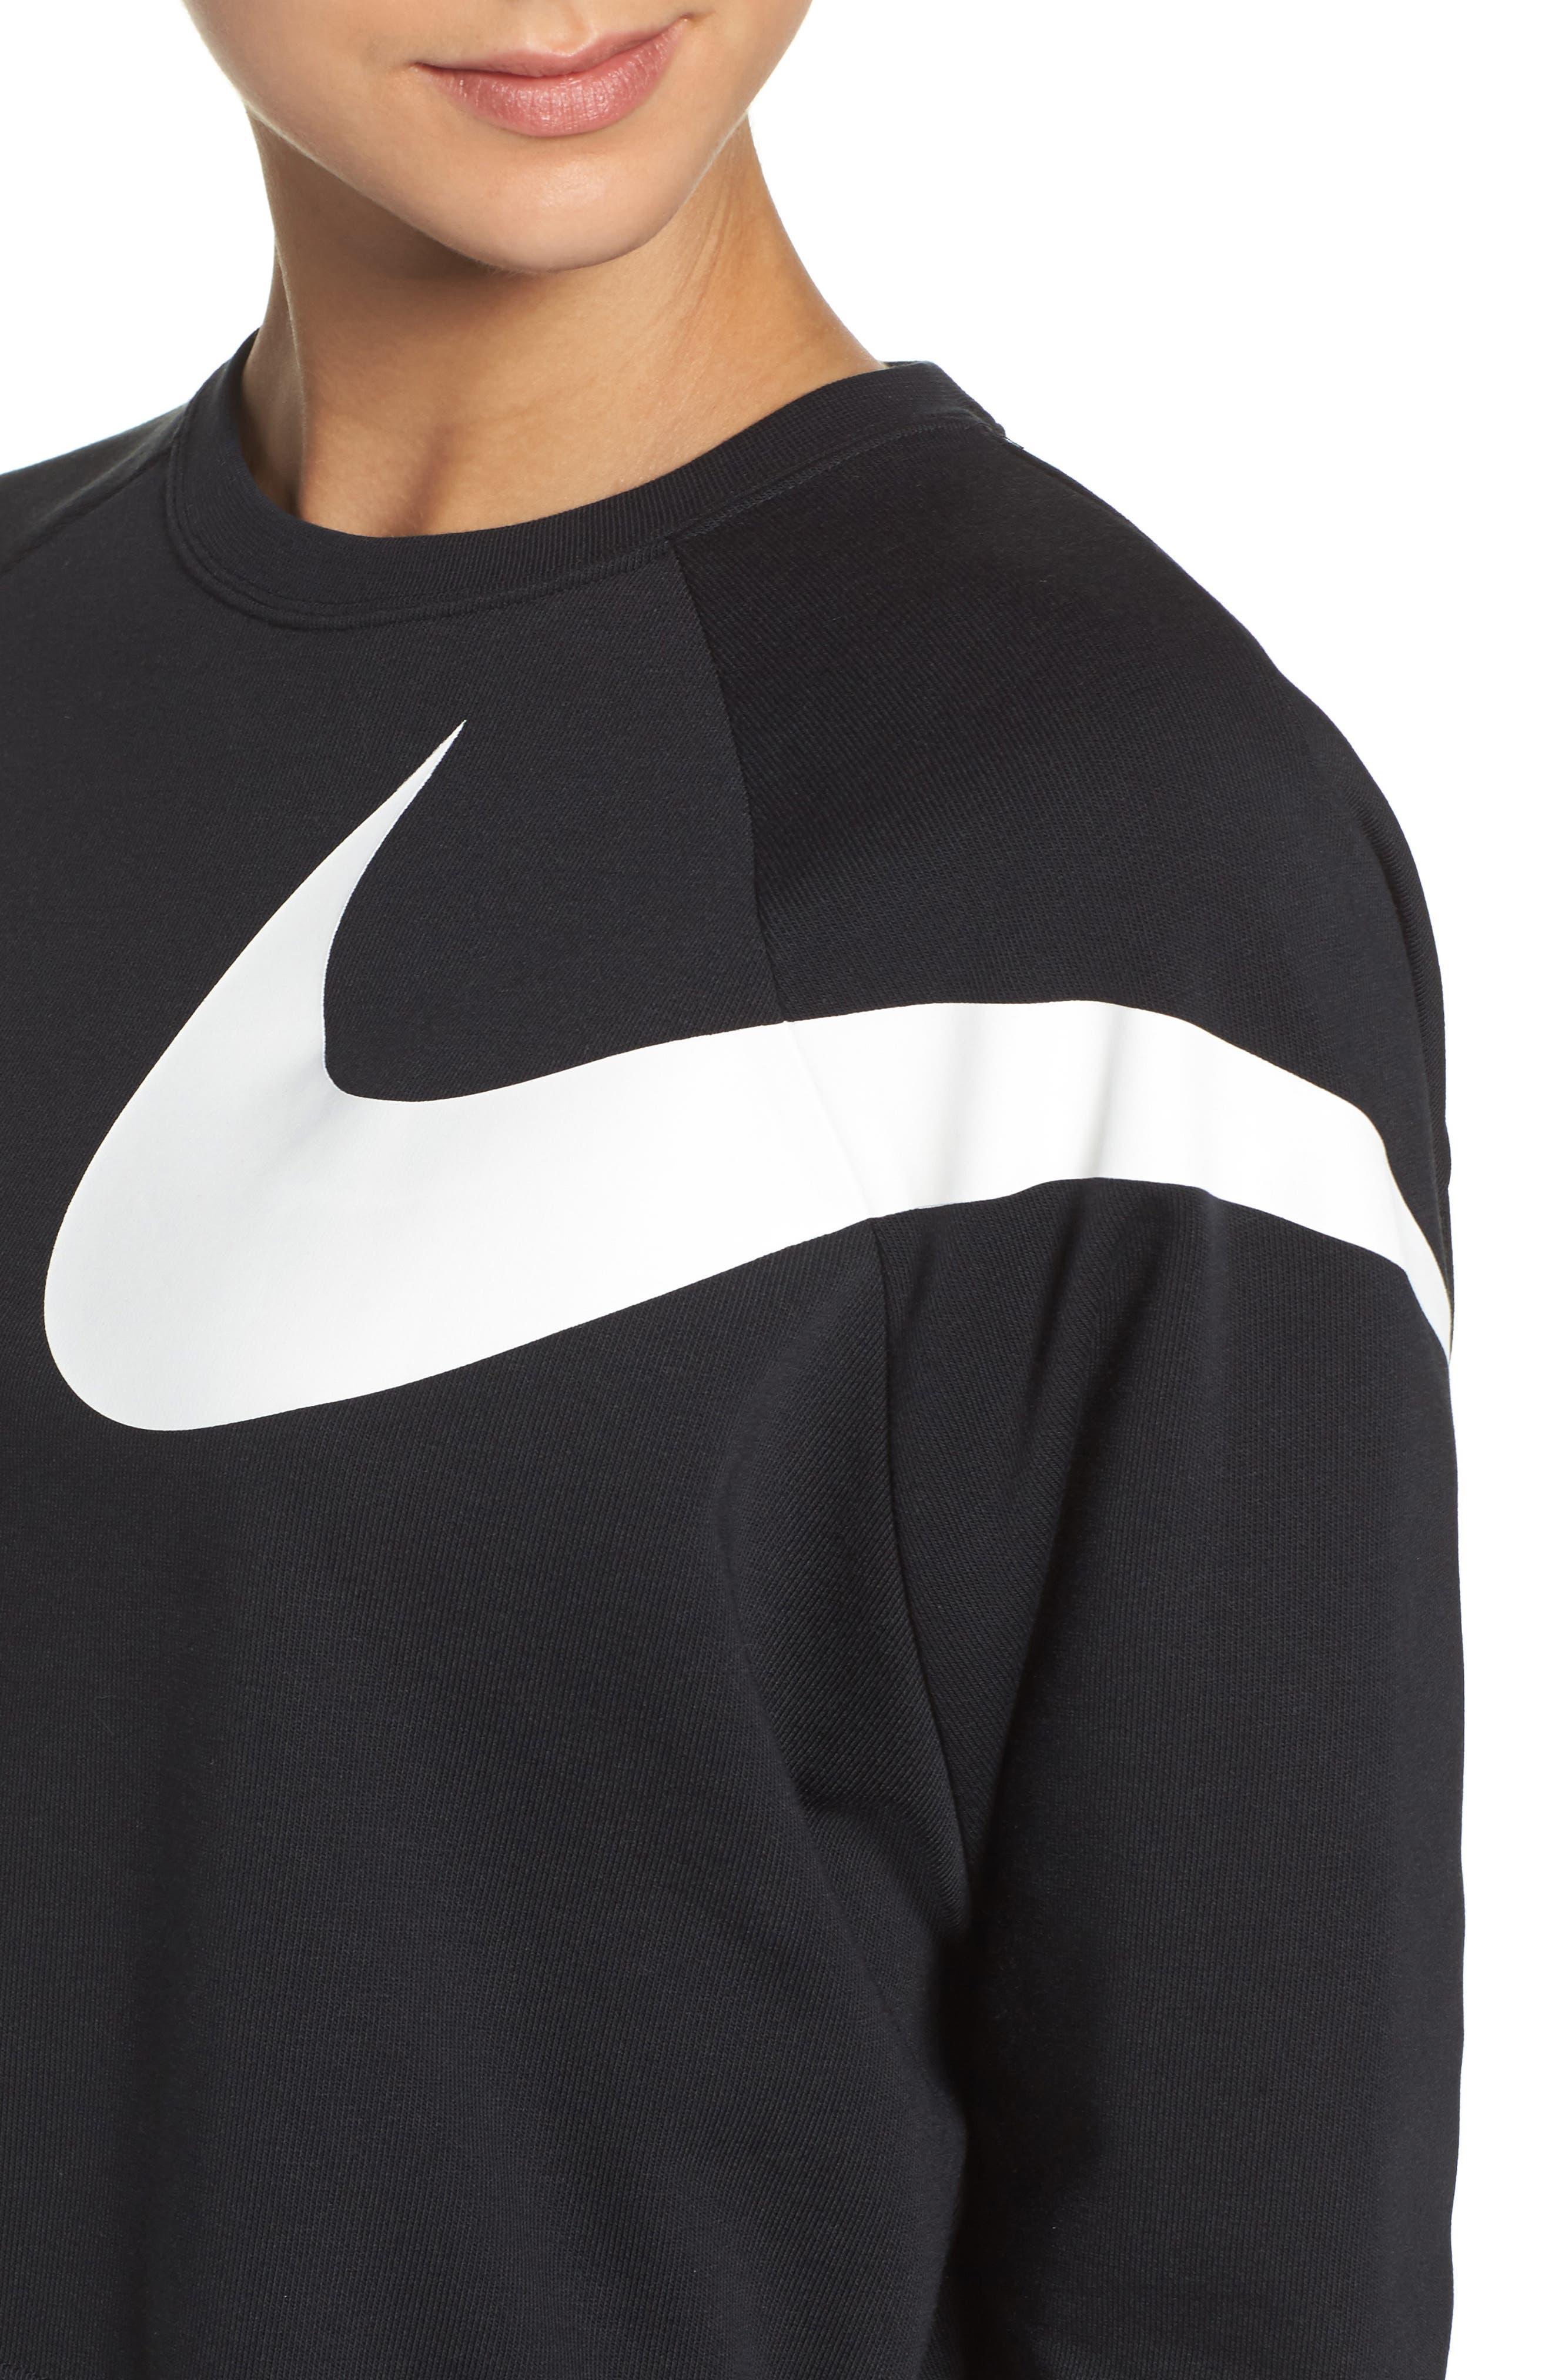 Alternate Image 4  - Nike Dry Versa Training Crop Top